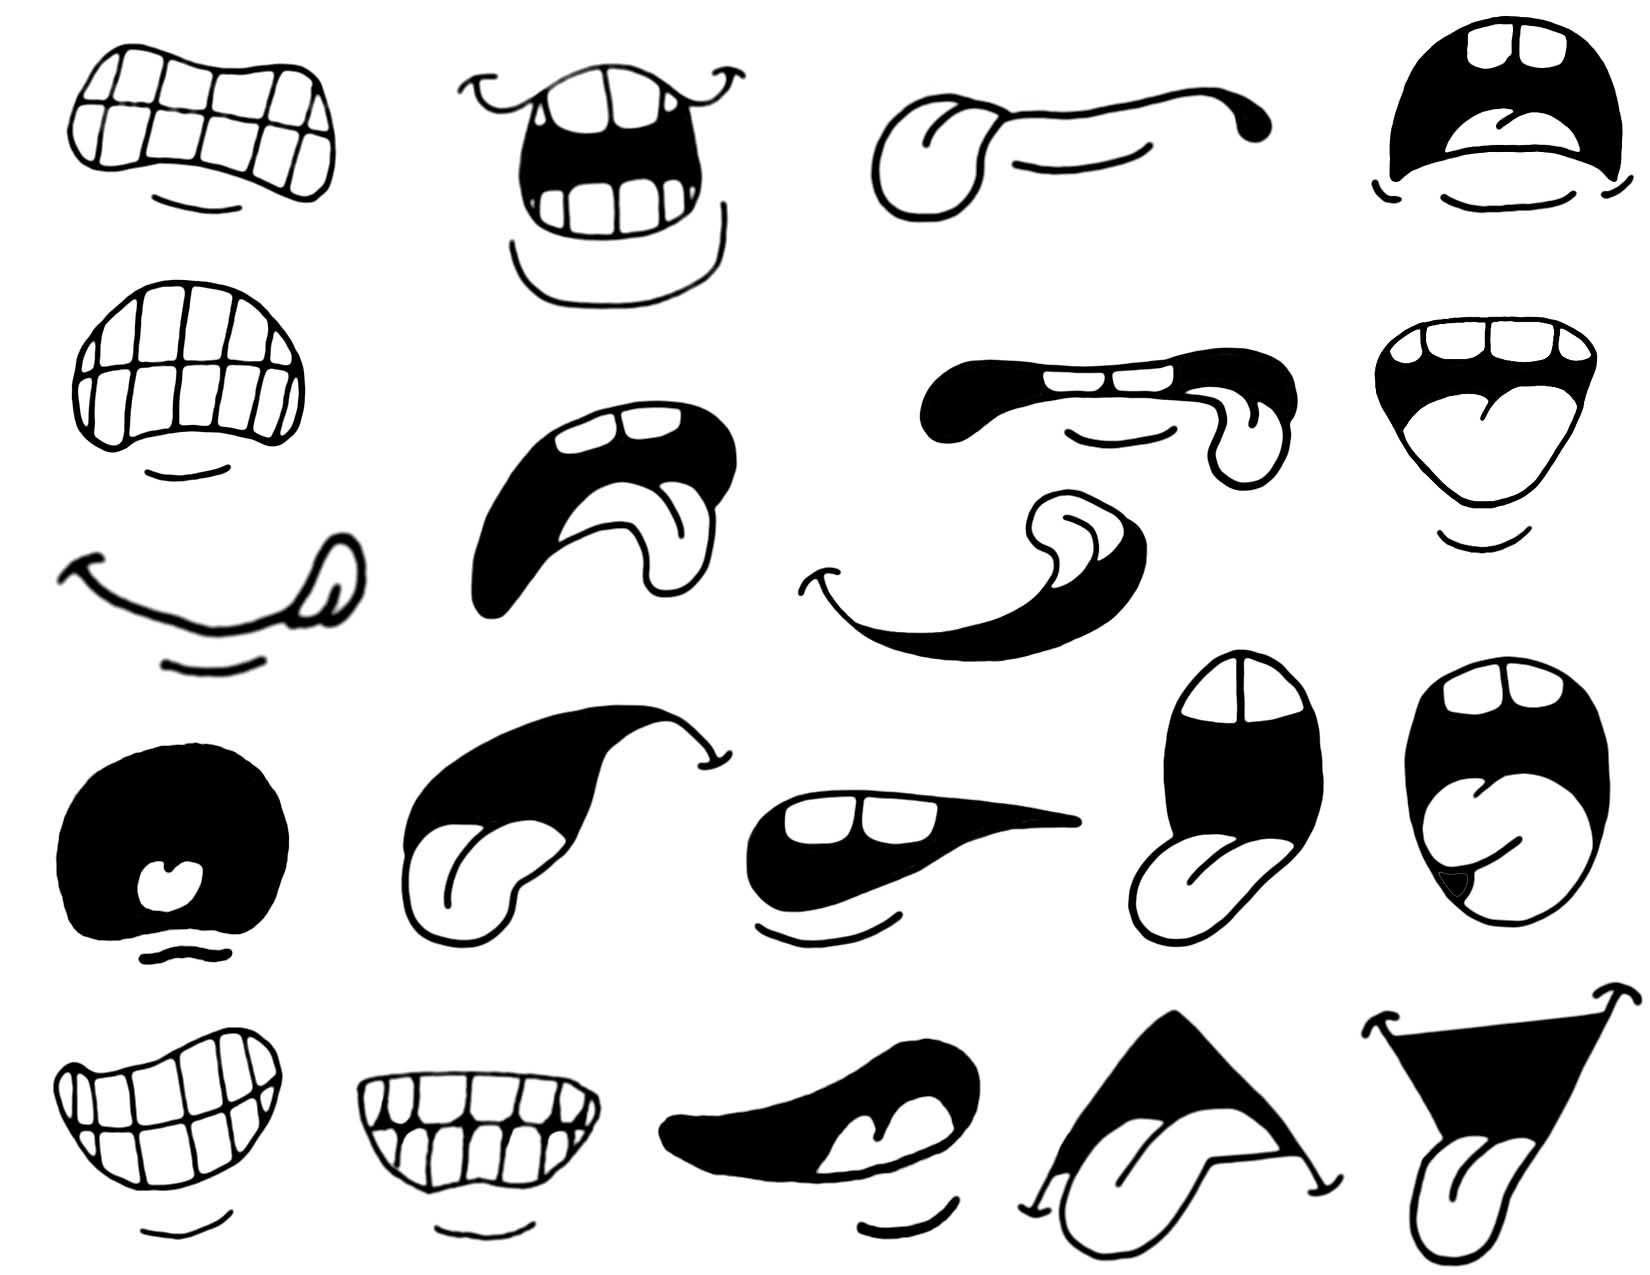 Cartoon Mouths Clipart.